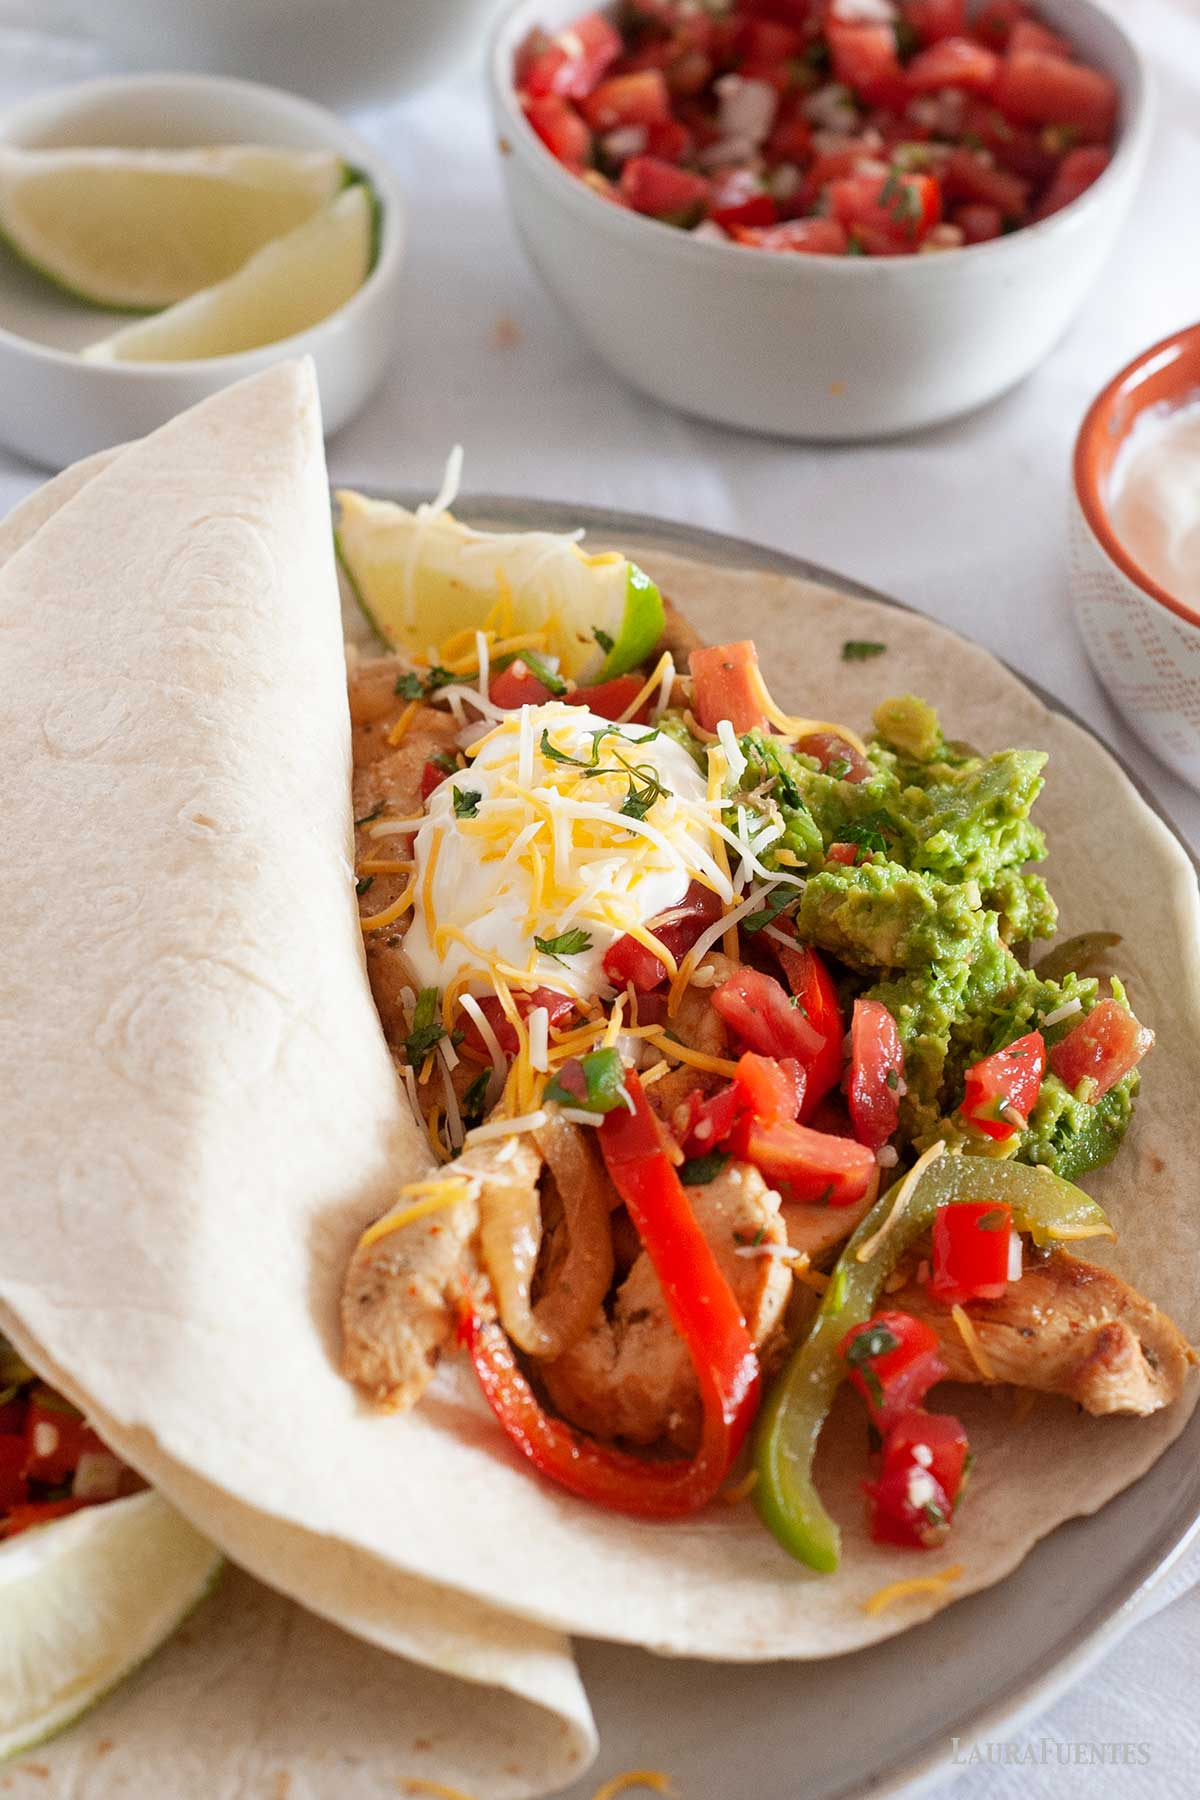 large chicken fajita taco on a plate